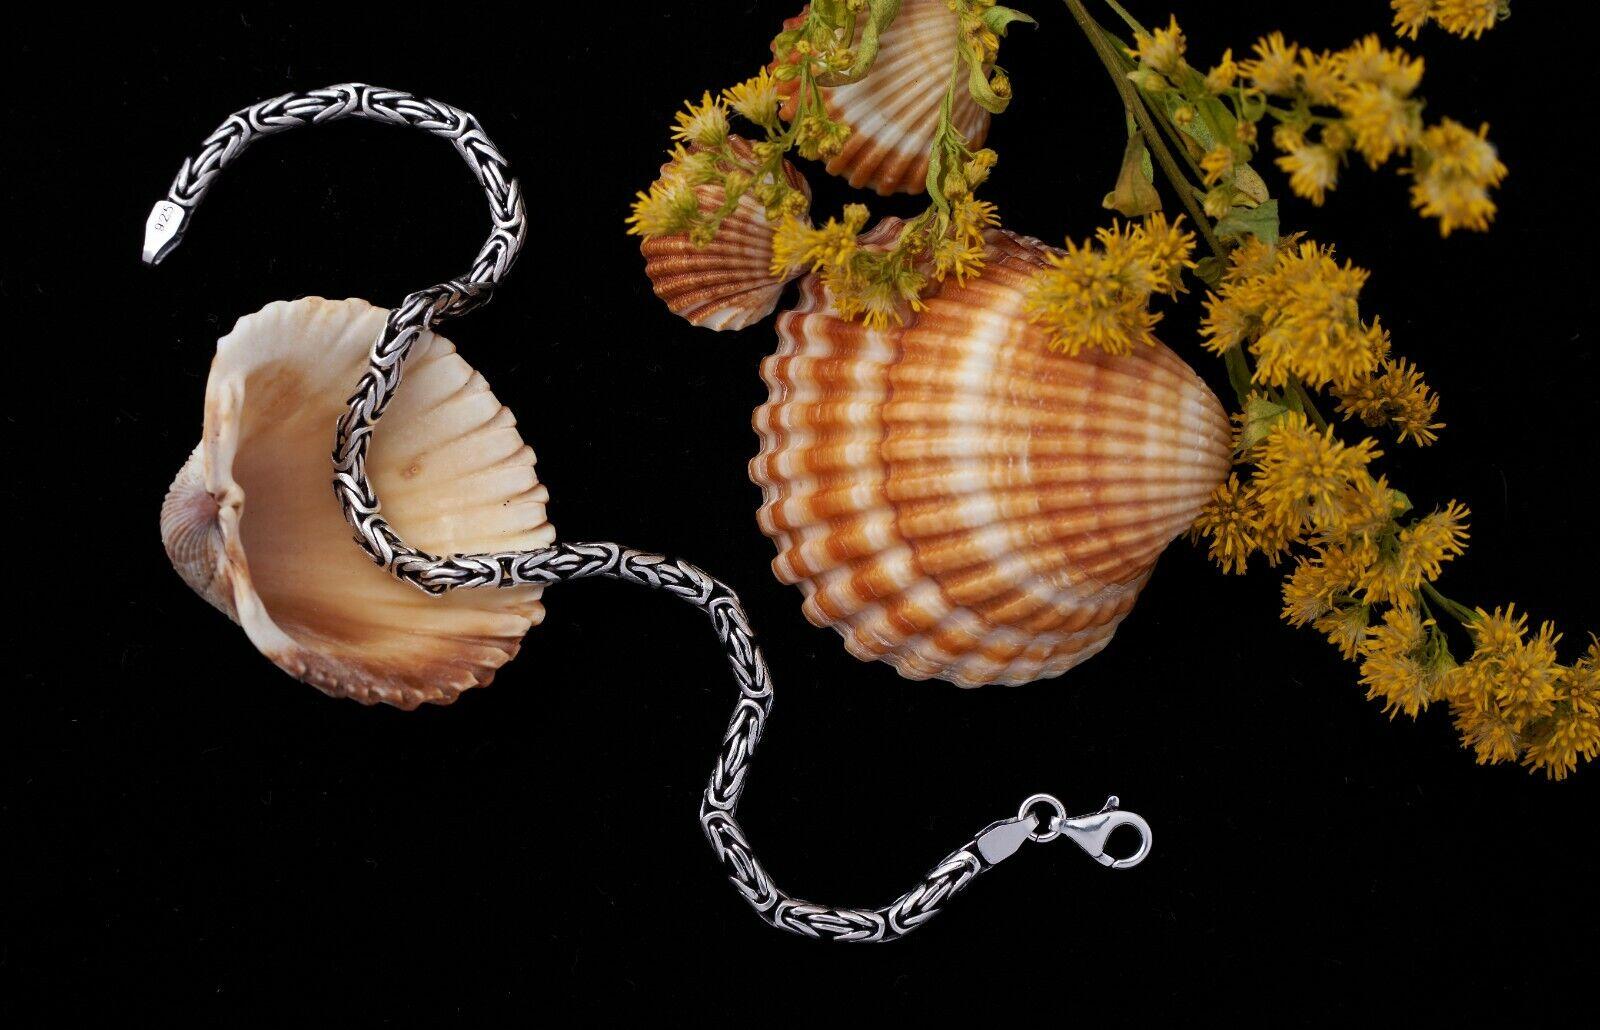 2.5mm Handmade 925 Sterling Silver Byzantine Chain Bracelets